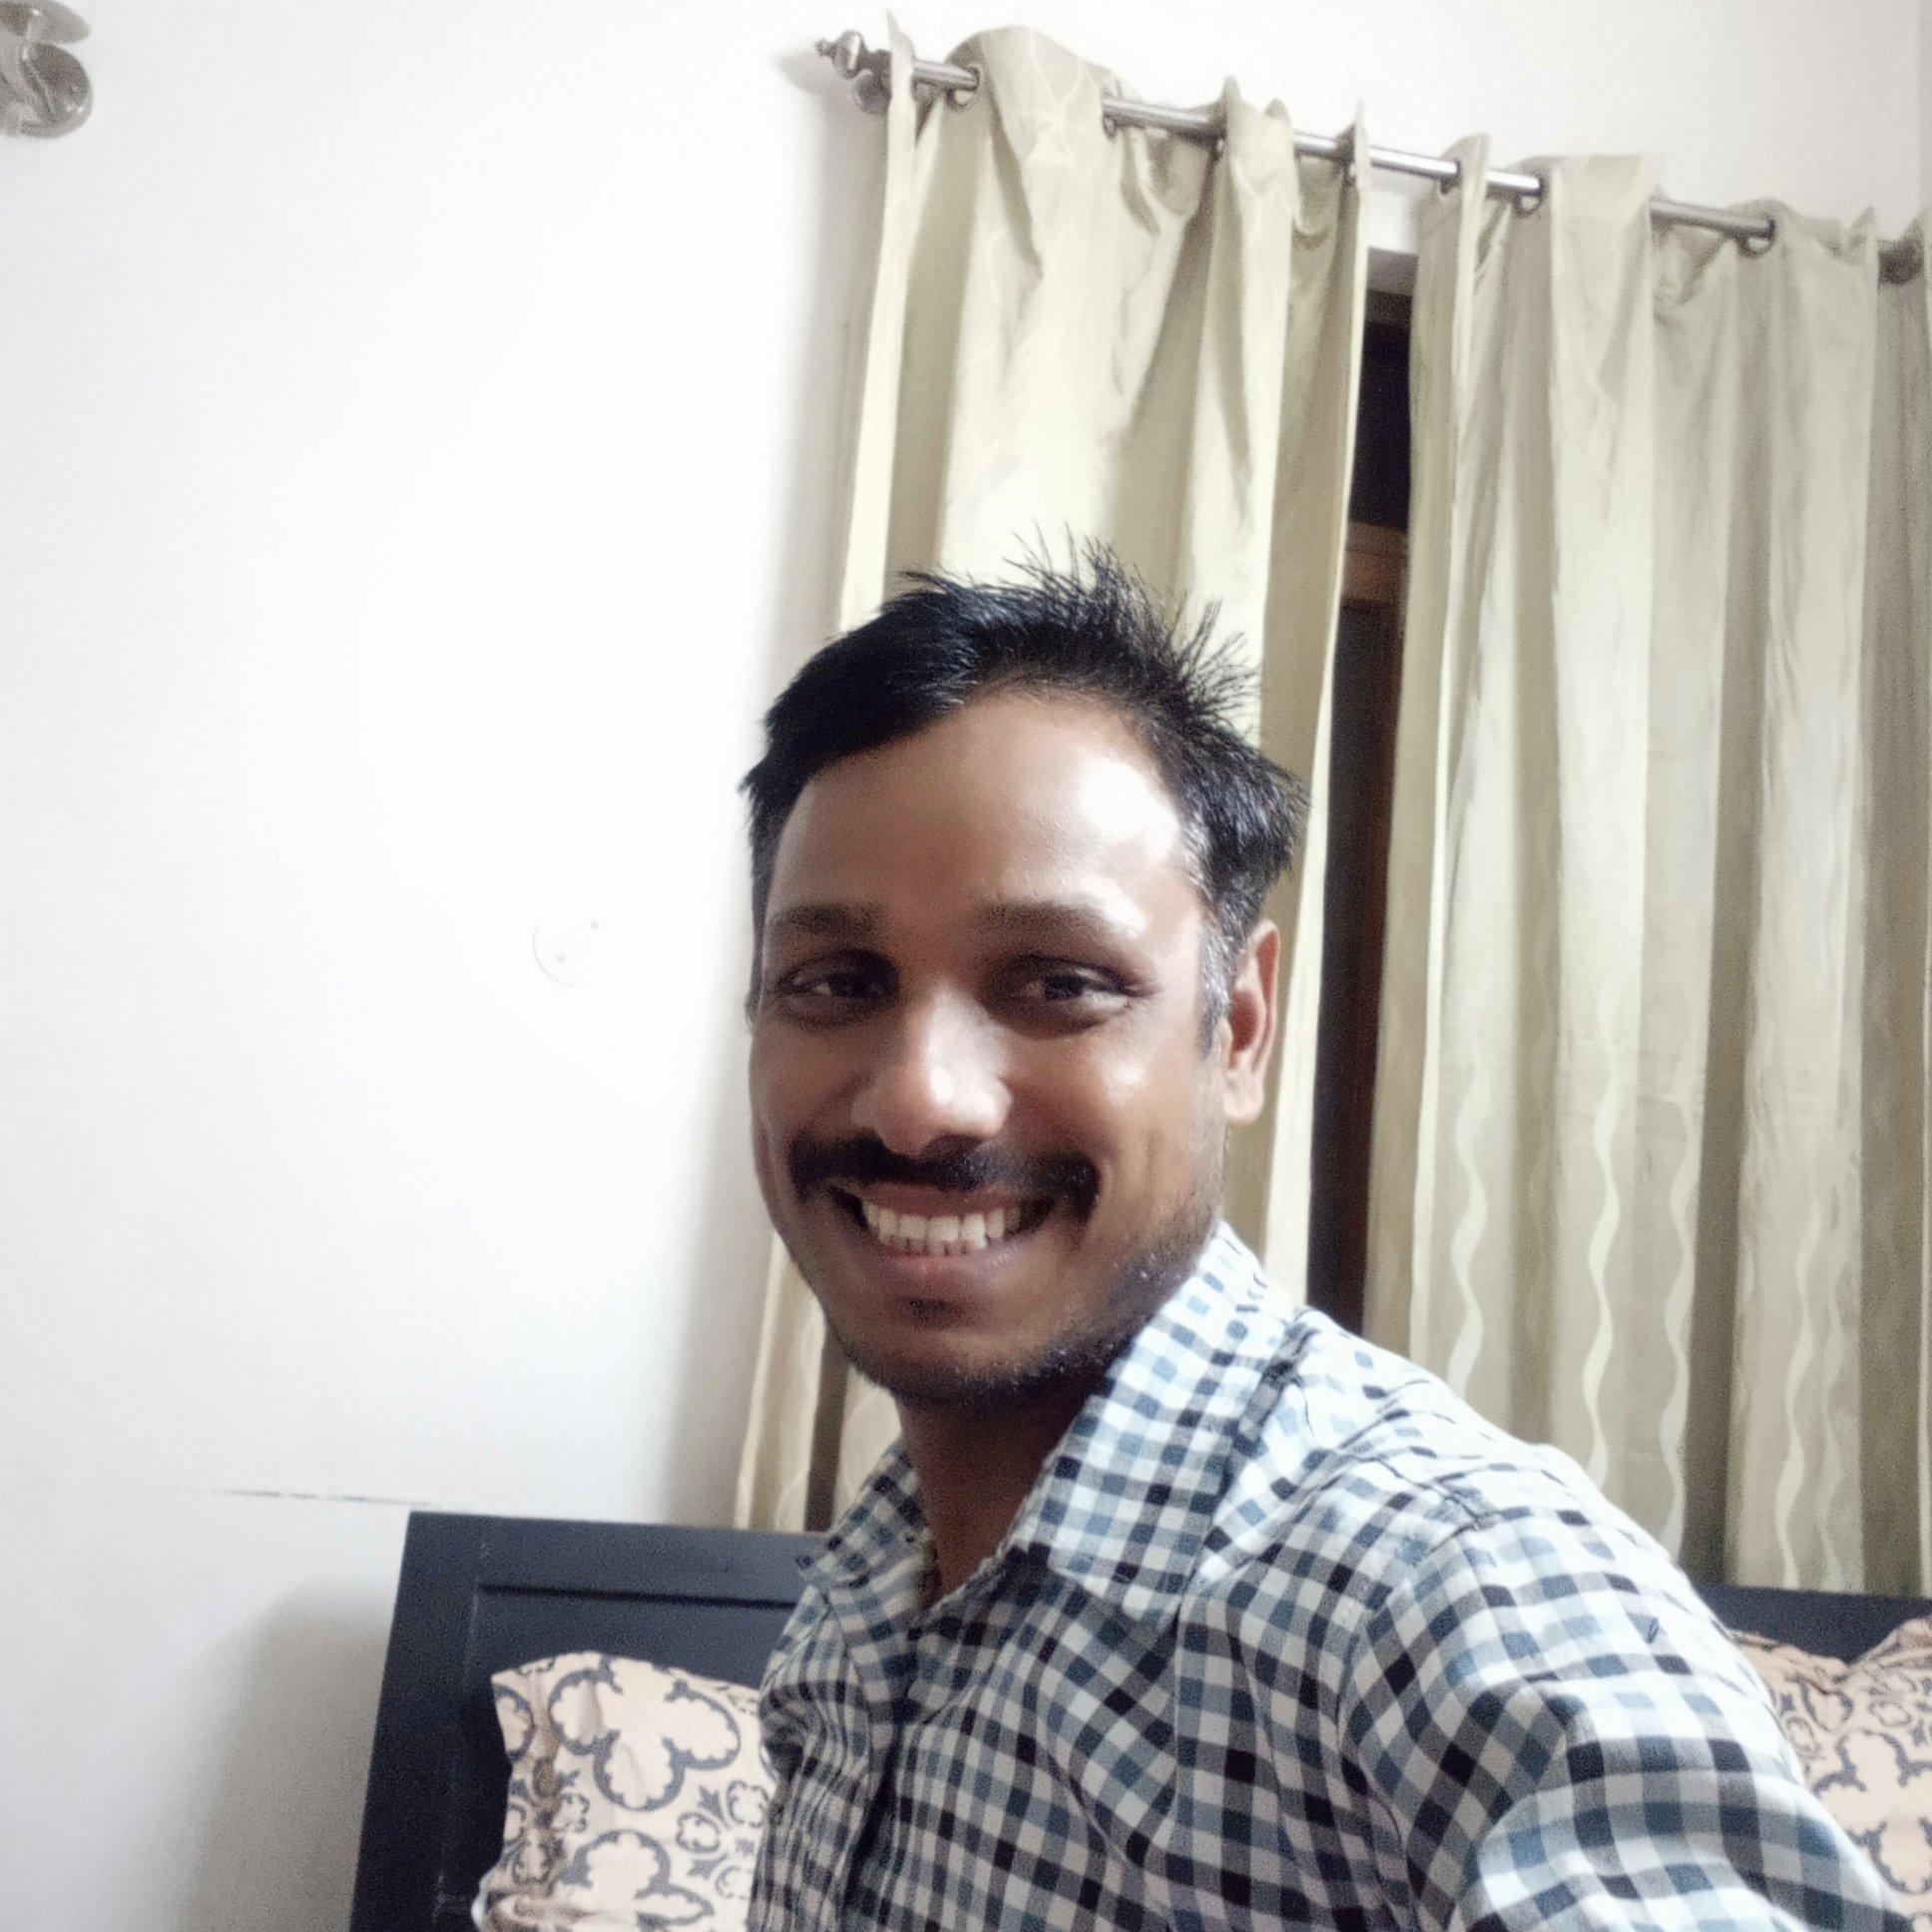 Hemant Kumar Prajapati